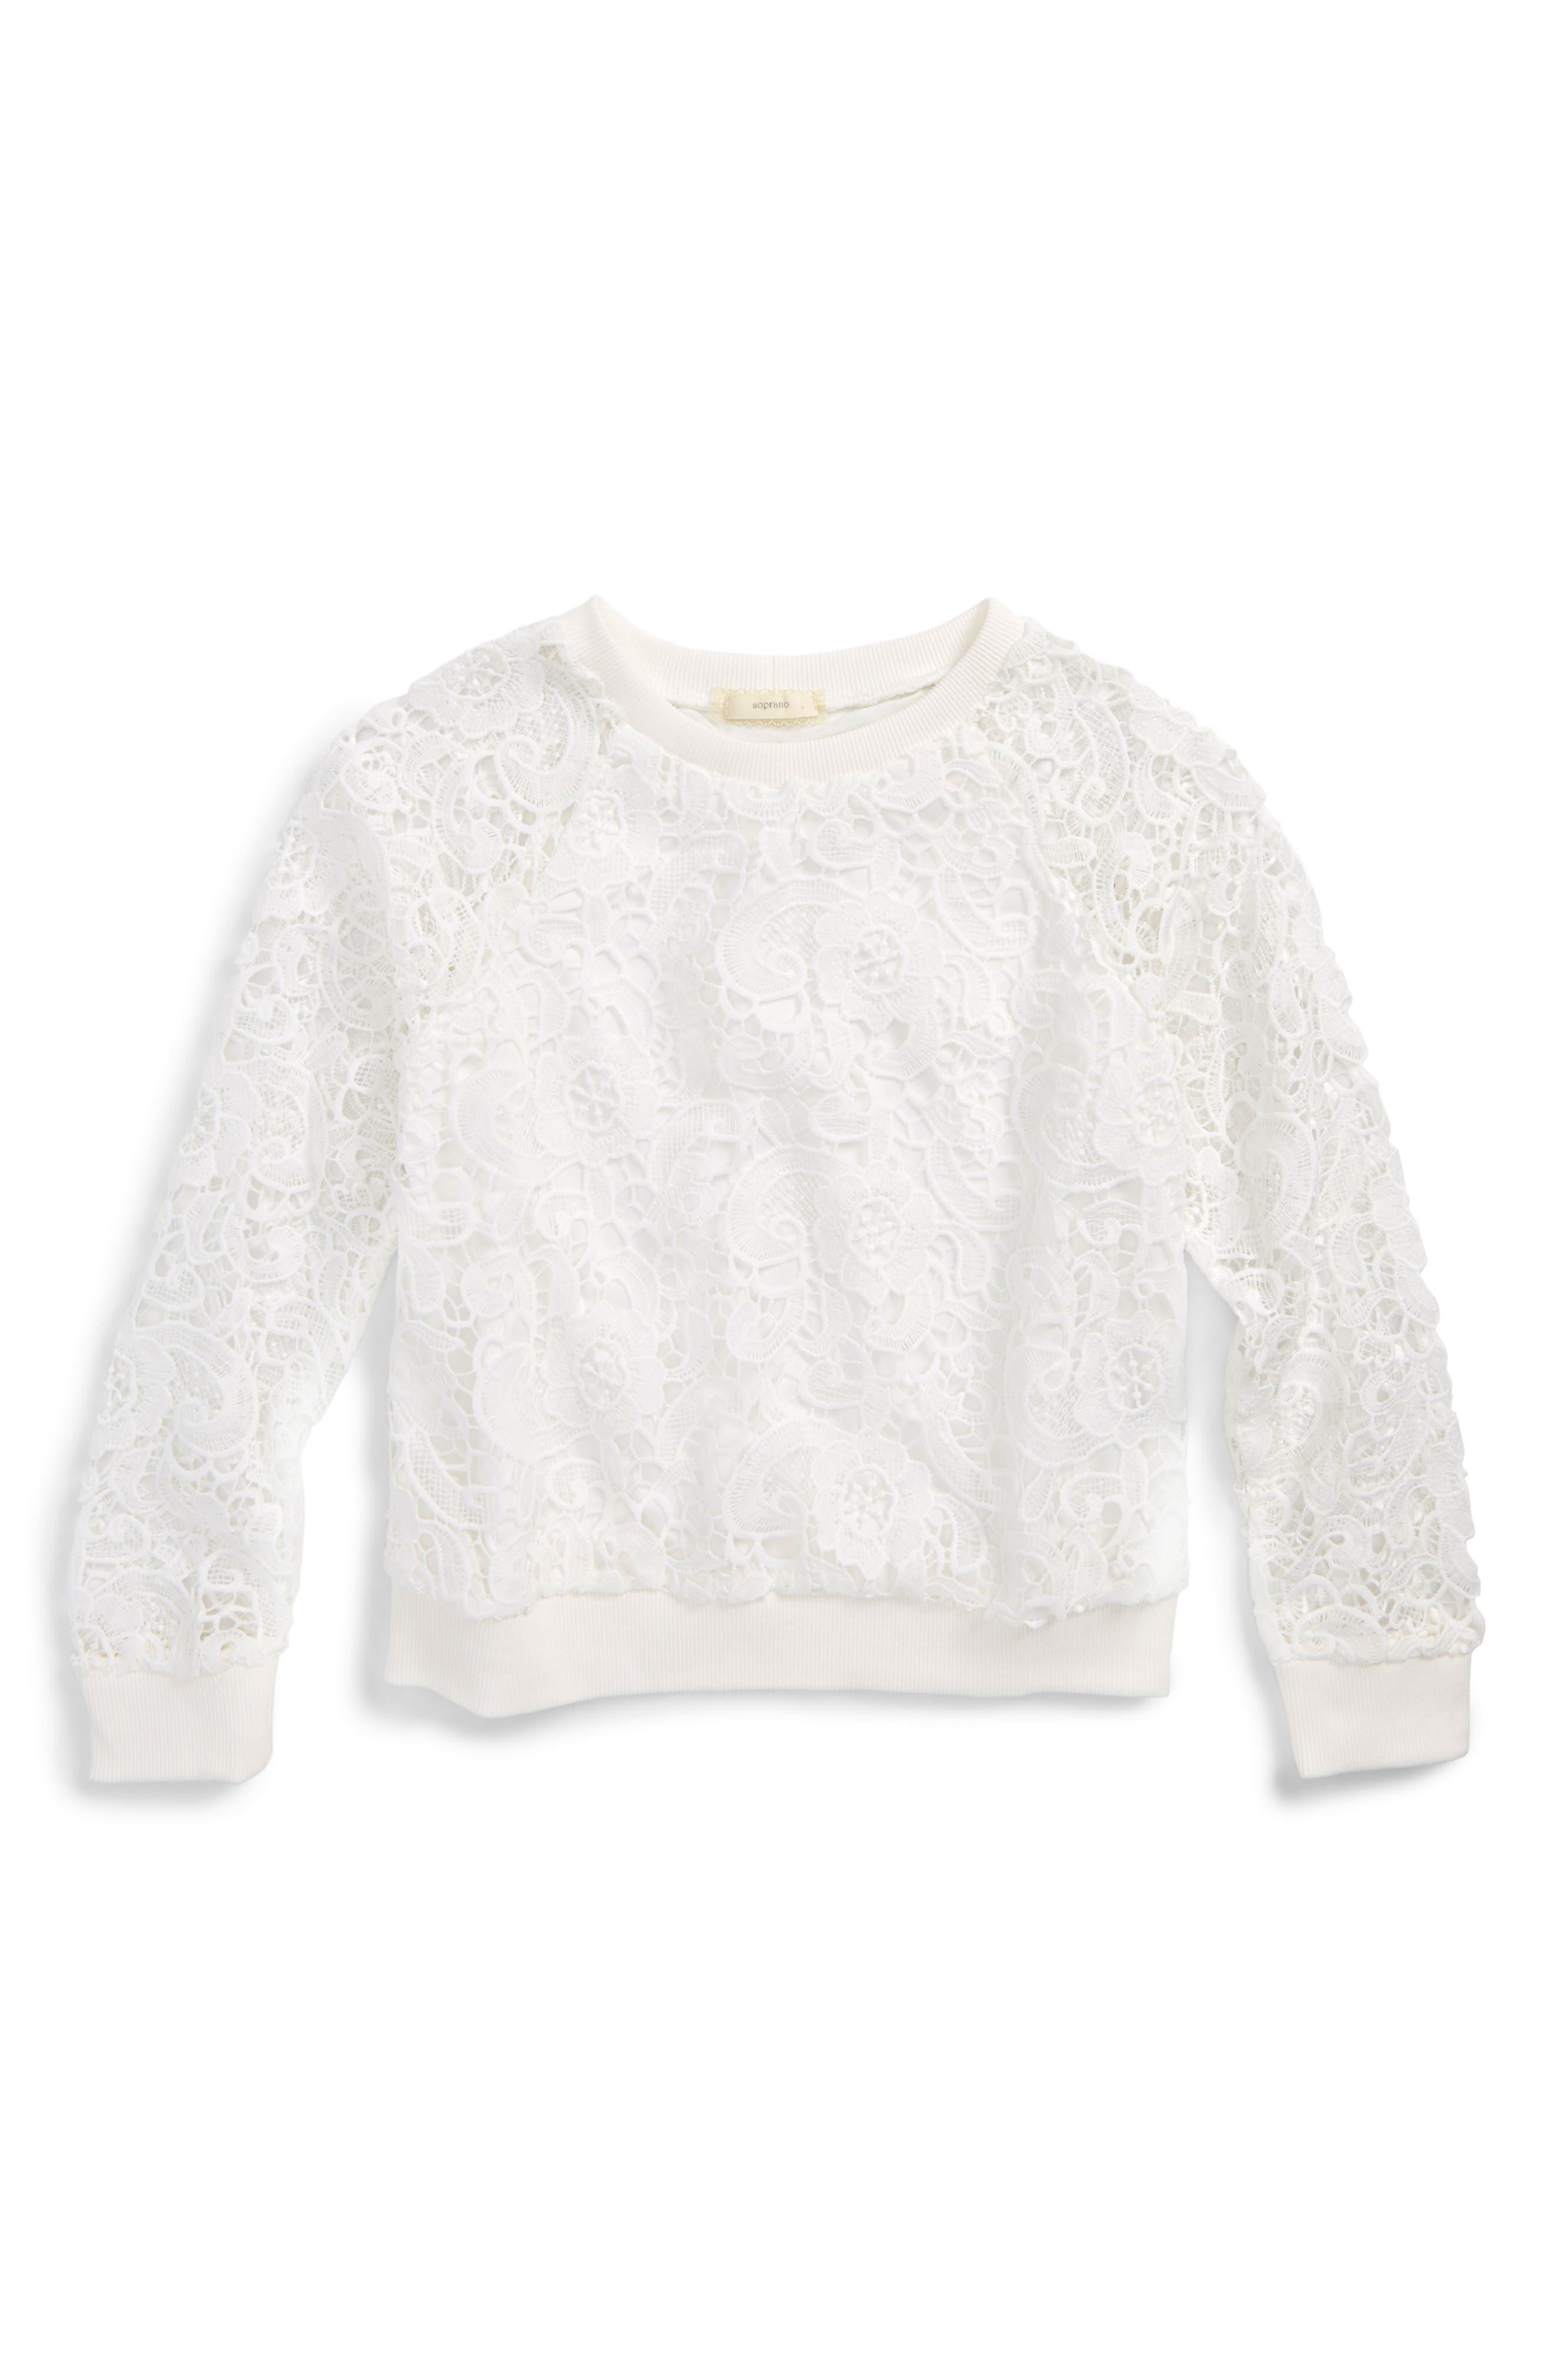 Lace Overlay Sweatshirt,                             Main thumbnail 1, color,                             106